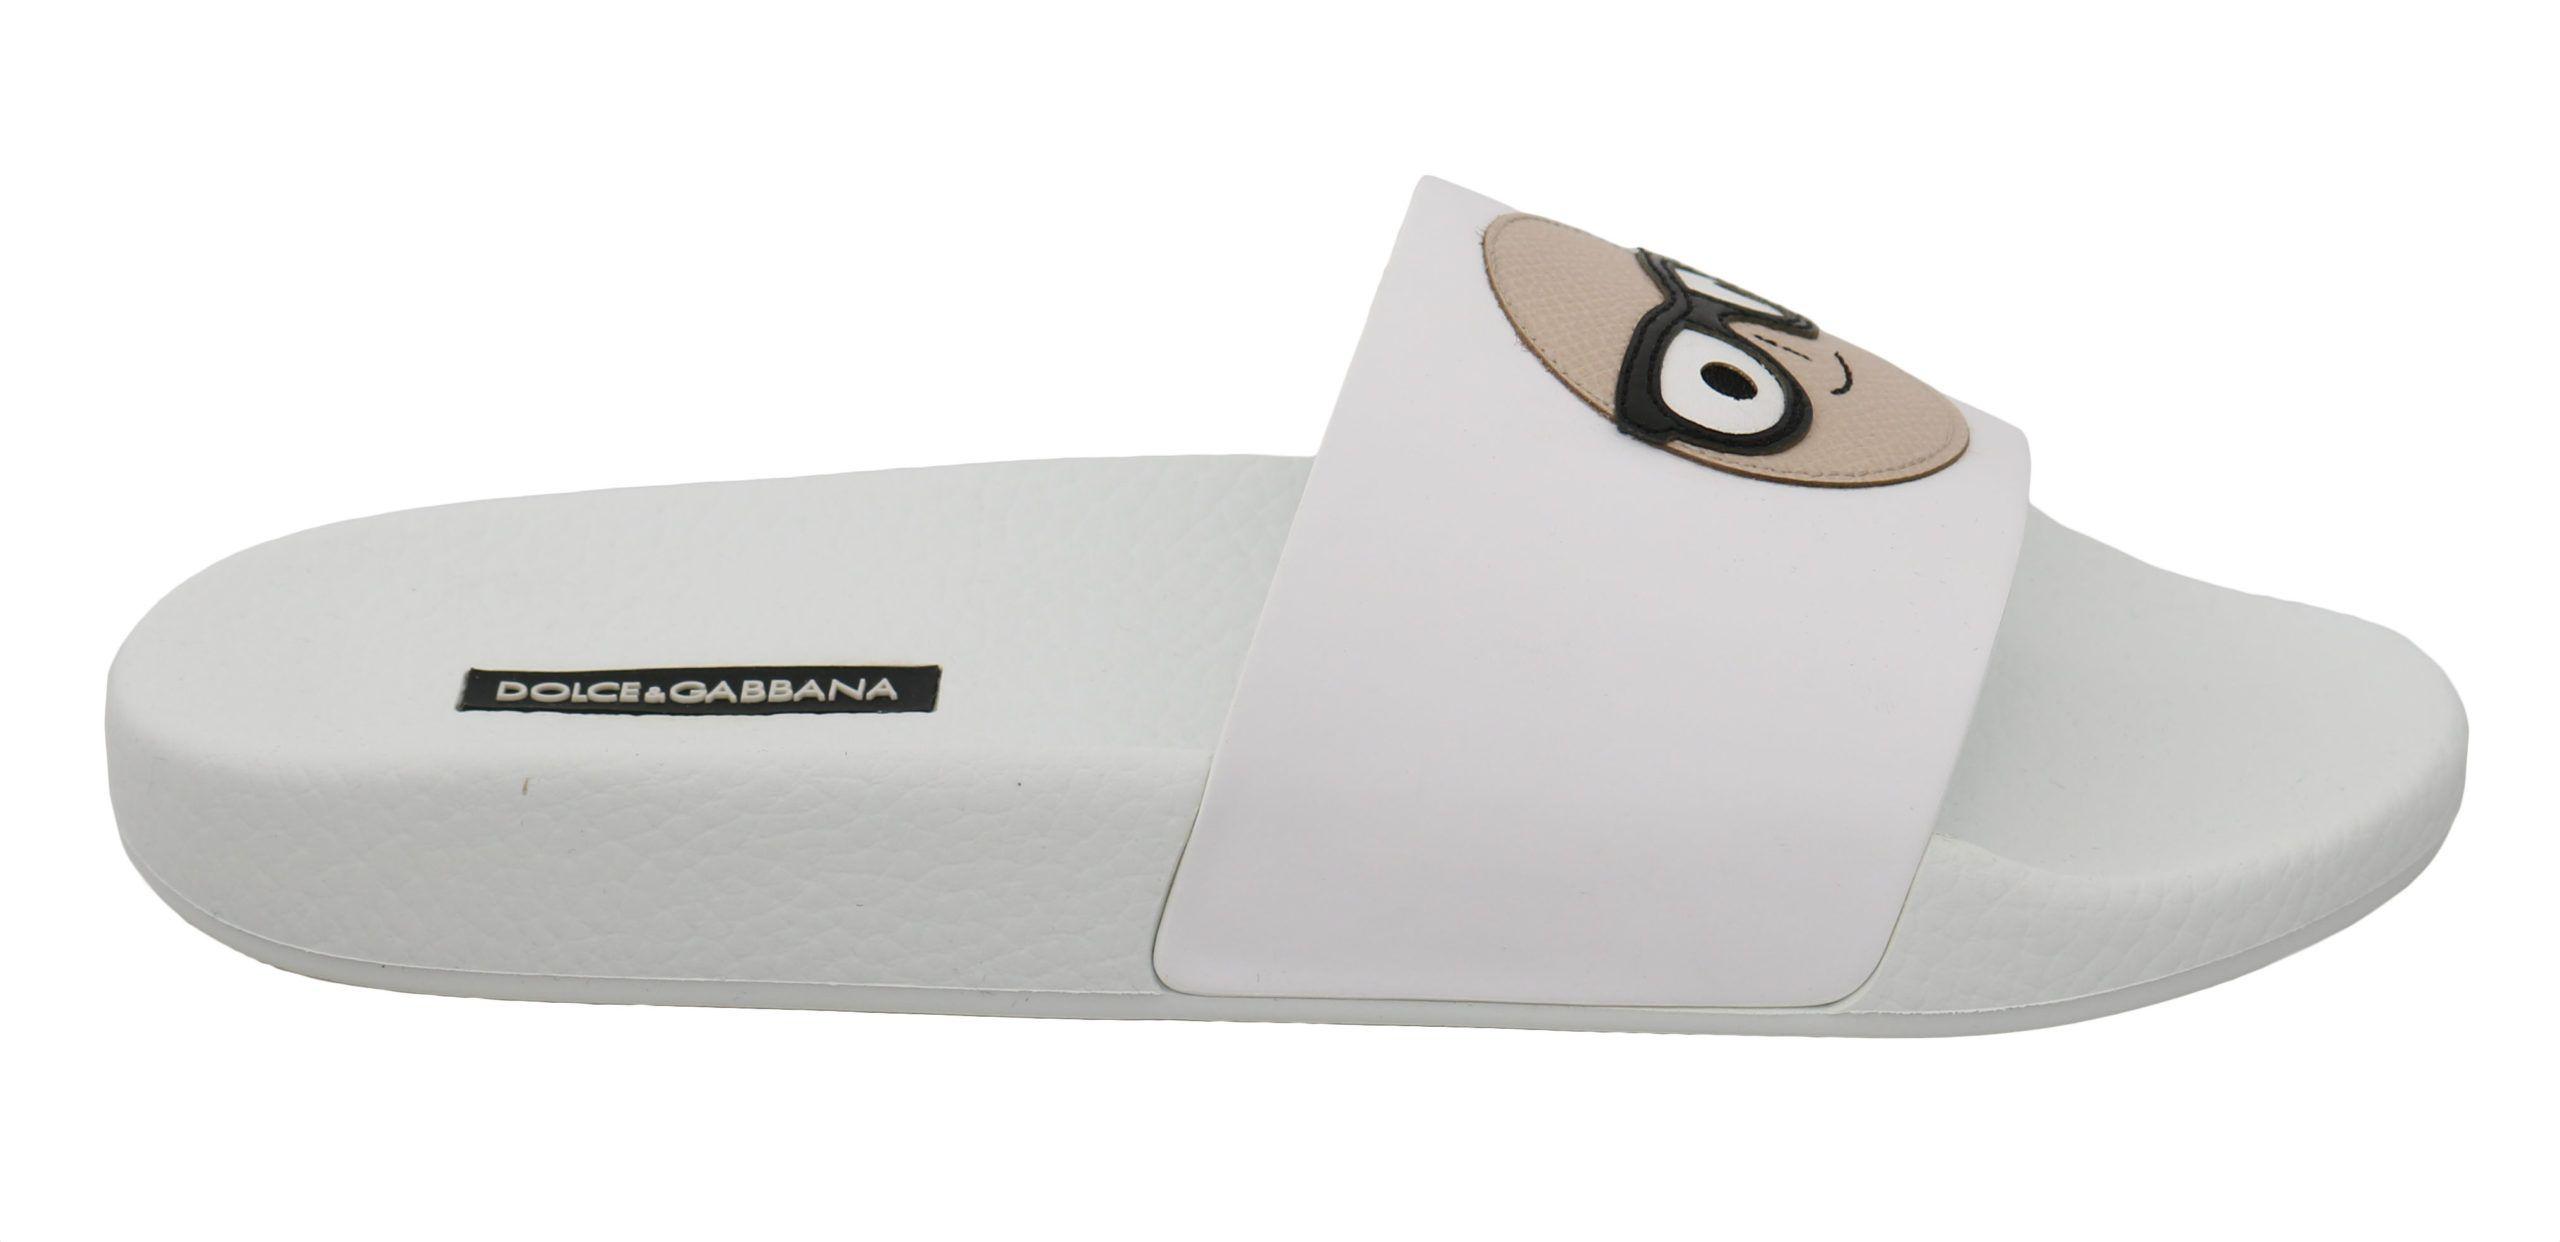 Dolce & Gabbana White Leather #dgfamily Slides Shoes Sandals